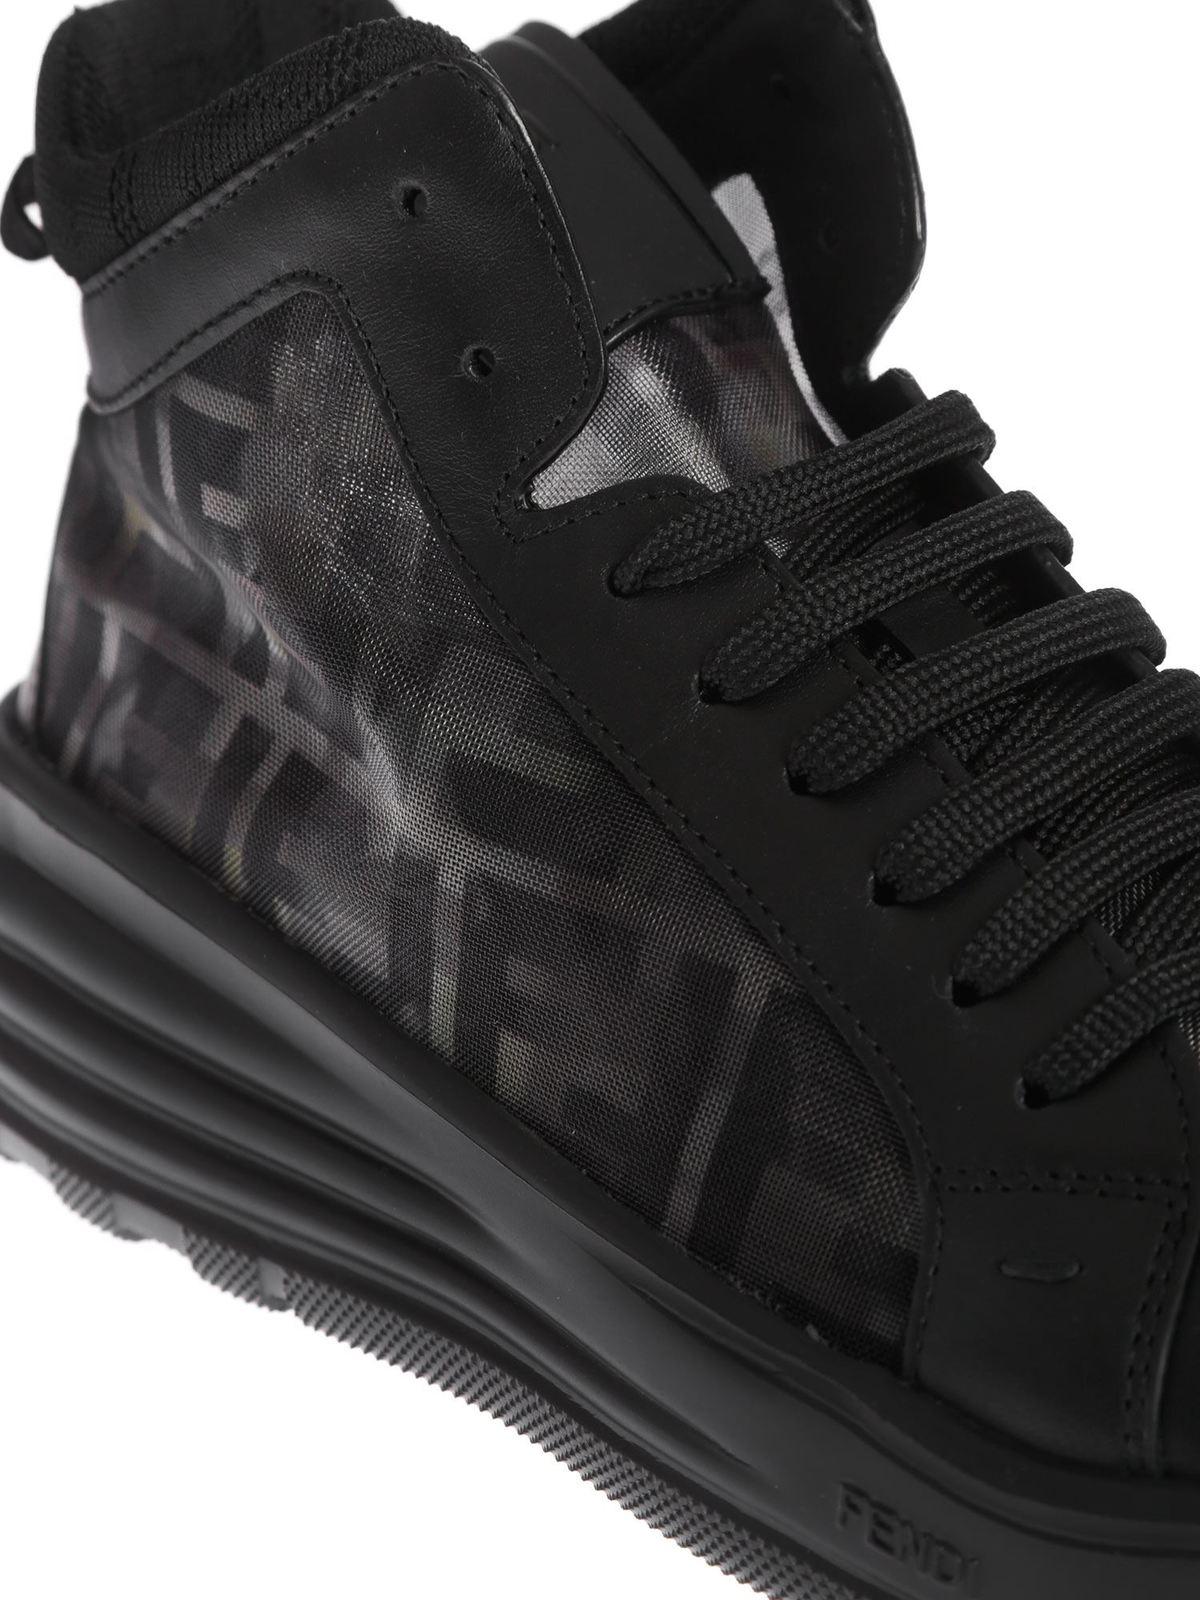 Fendi - High top sneakers in black with